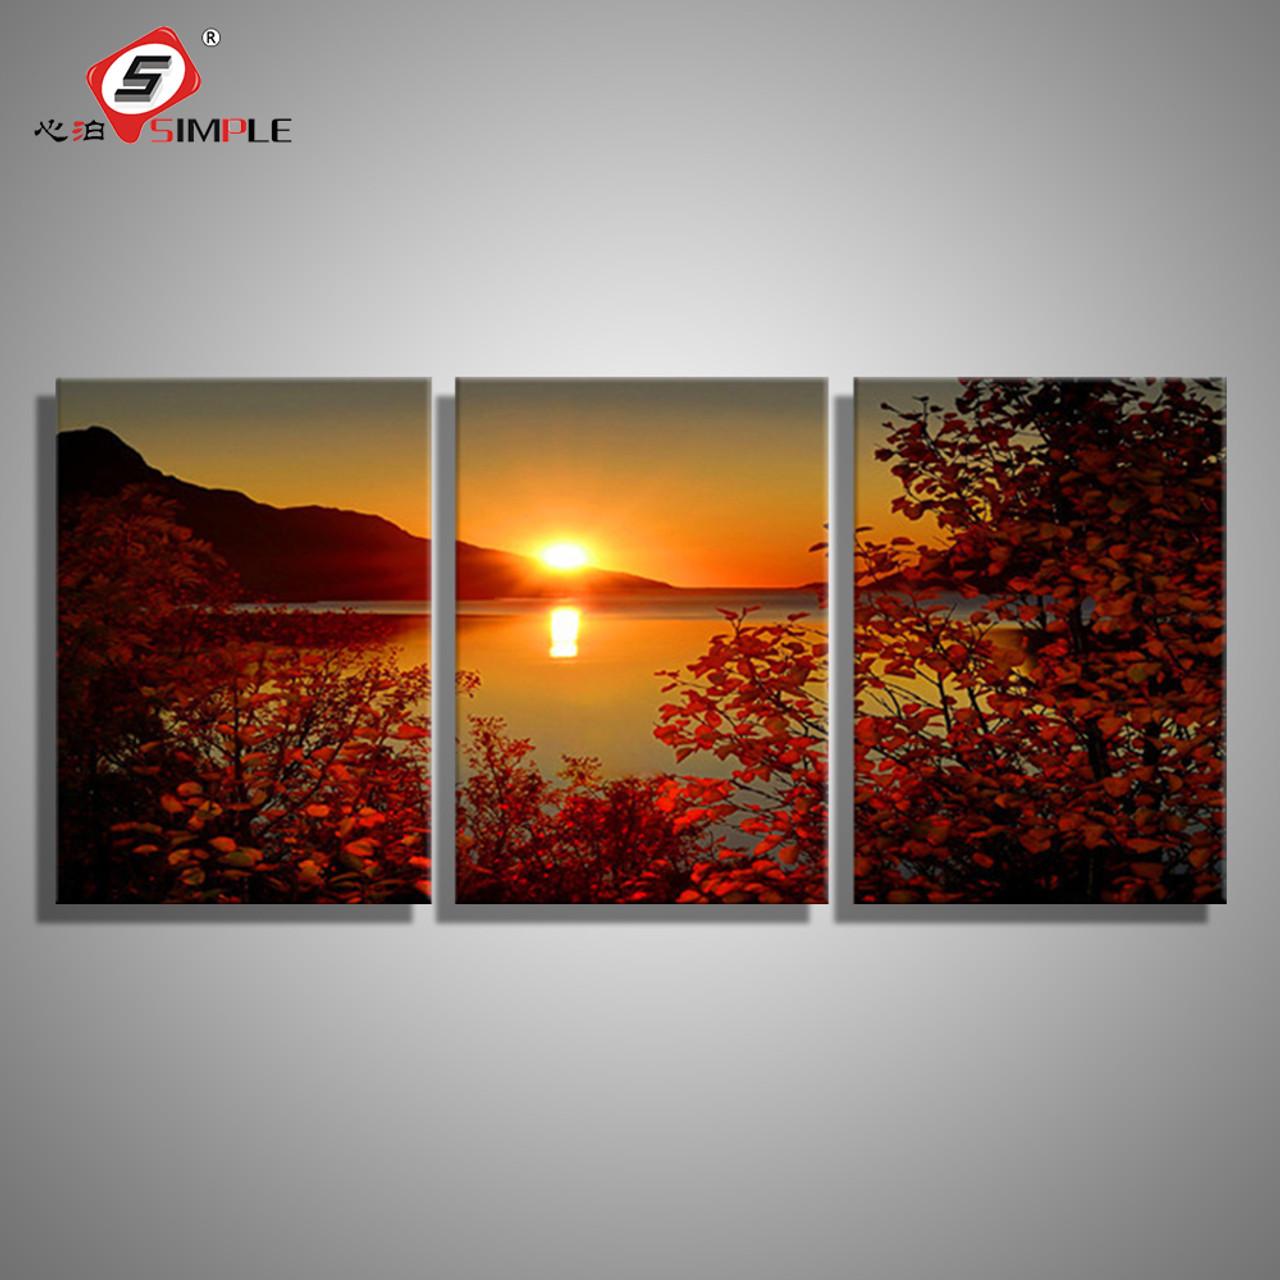 SIMPLE Oil Painting Canvas Lake Sunset Landscape Wall Art Decoration Prints Home Decor Modern Picture